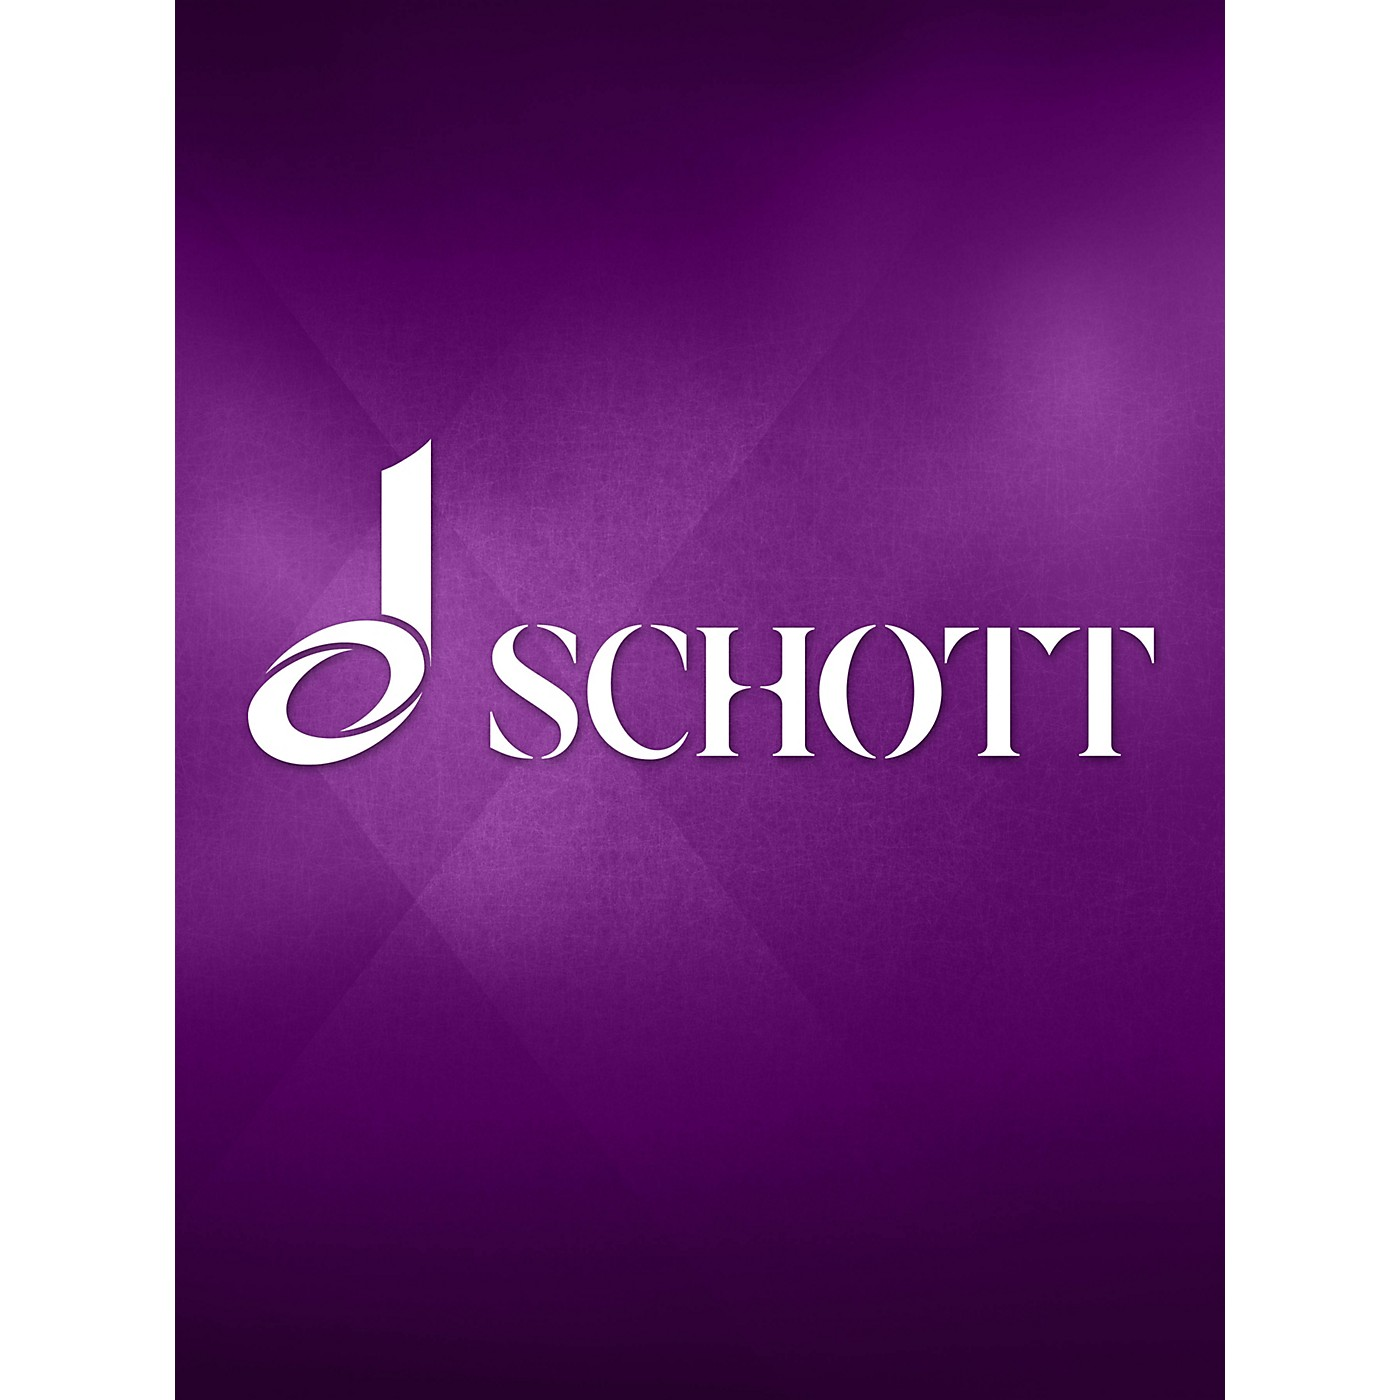 Hal Leonard Beethoven Notebook Beige (3-pack) Retail $7.99 Each Schott Series thumbnail